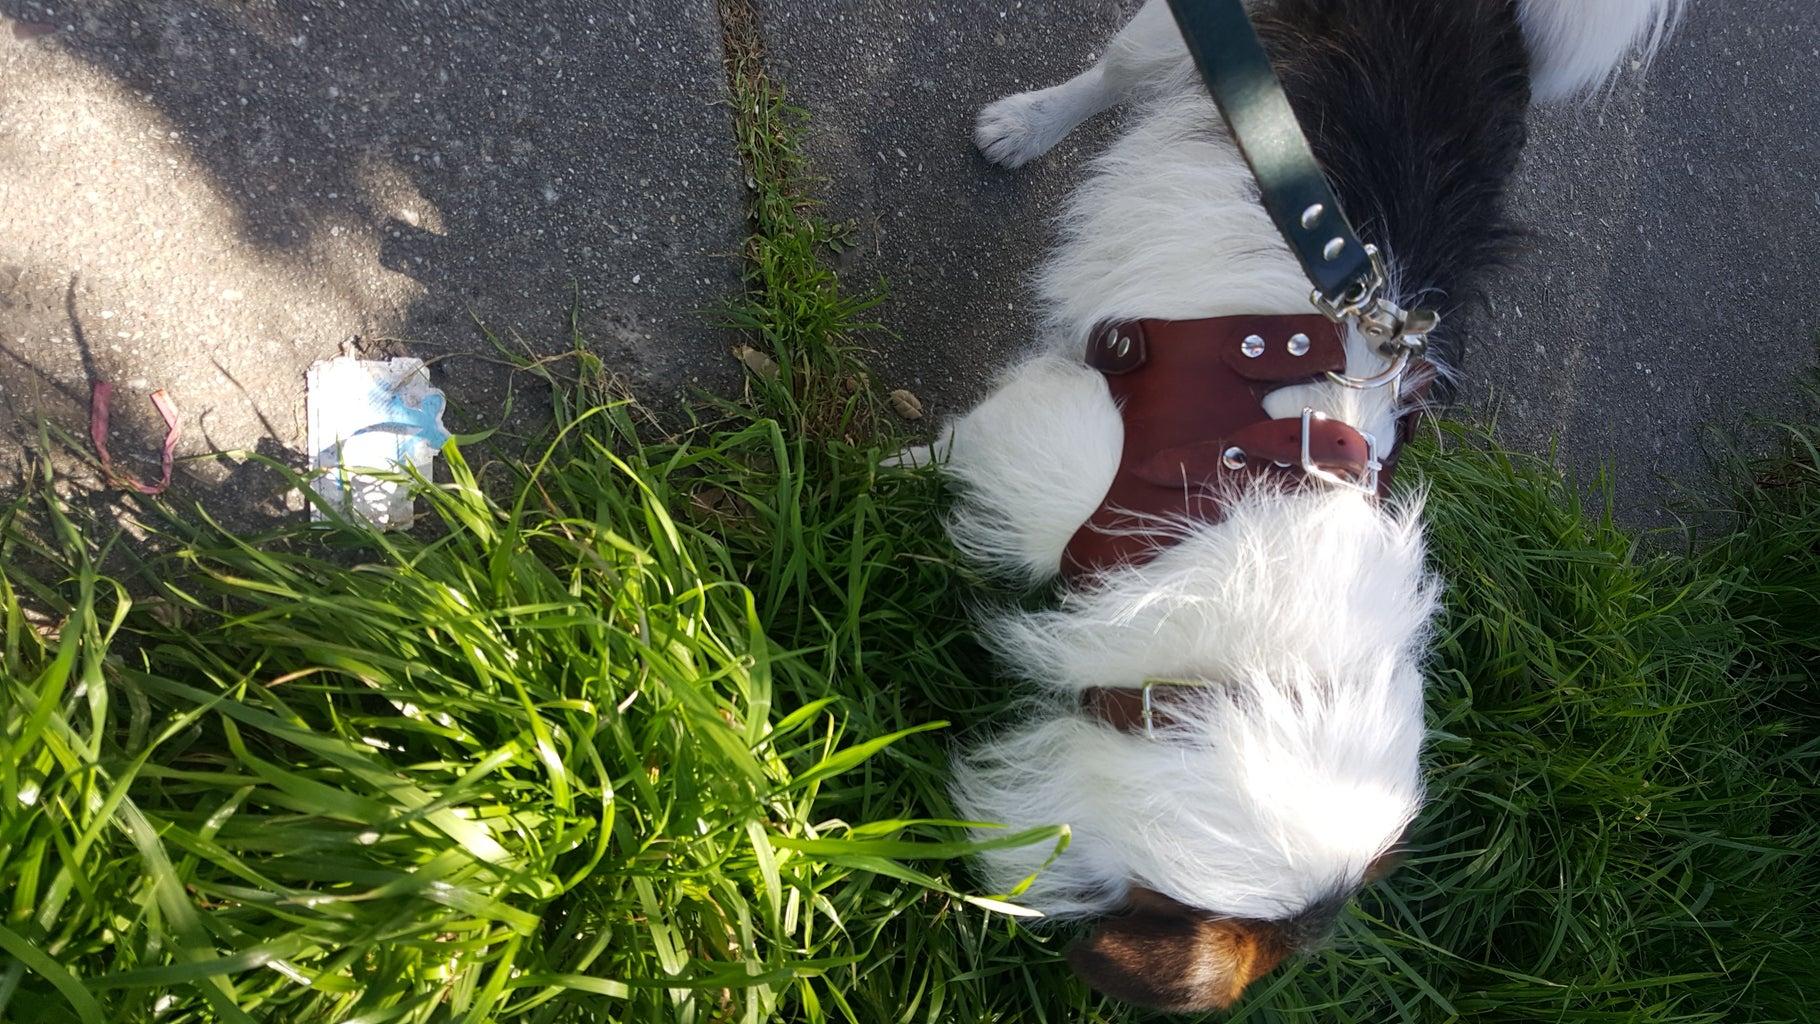 Go Walk Your Dog Now!